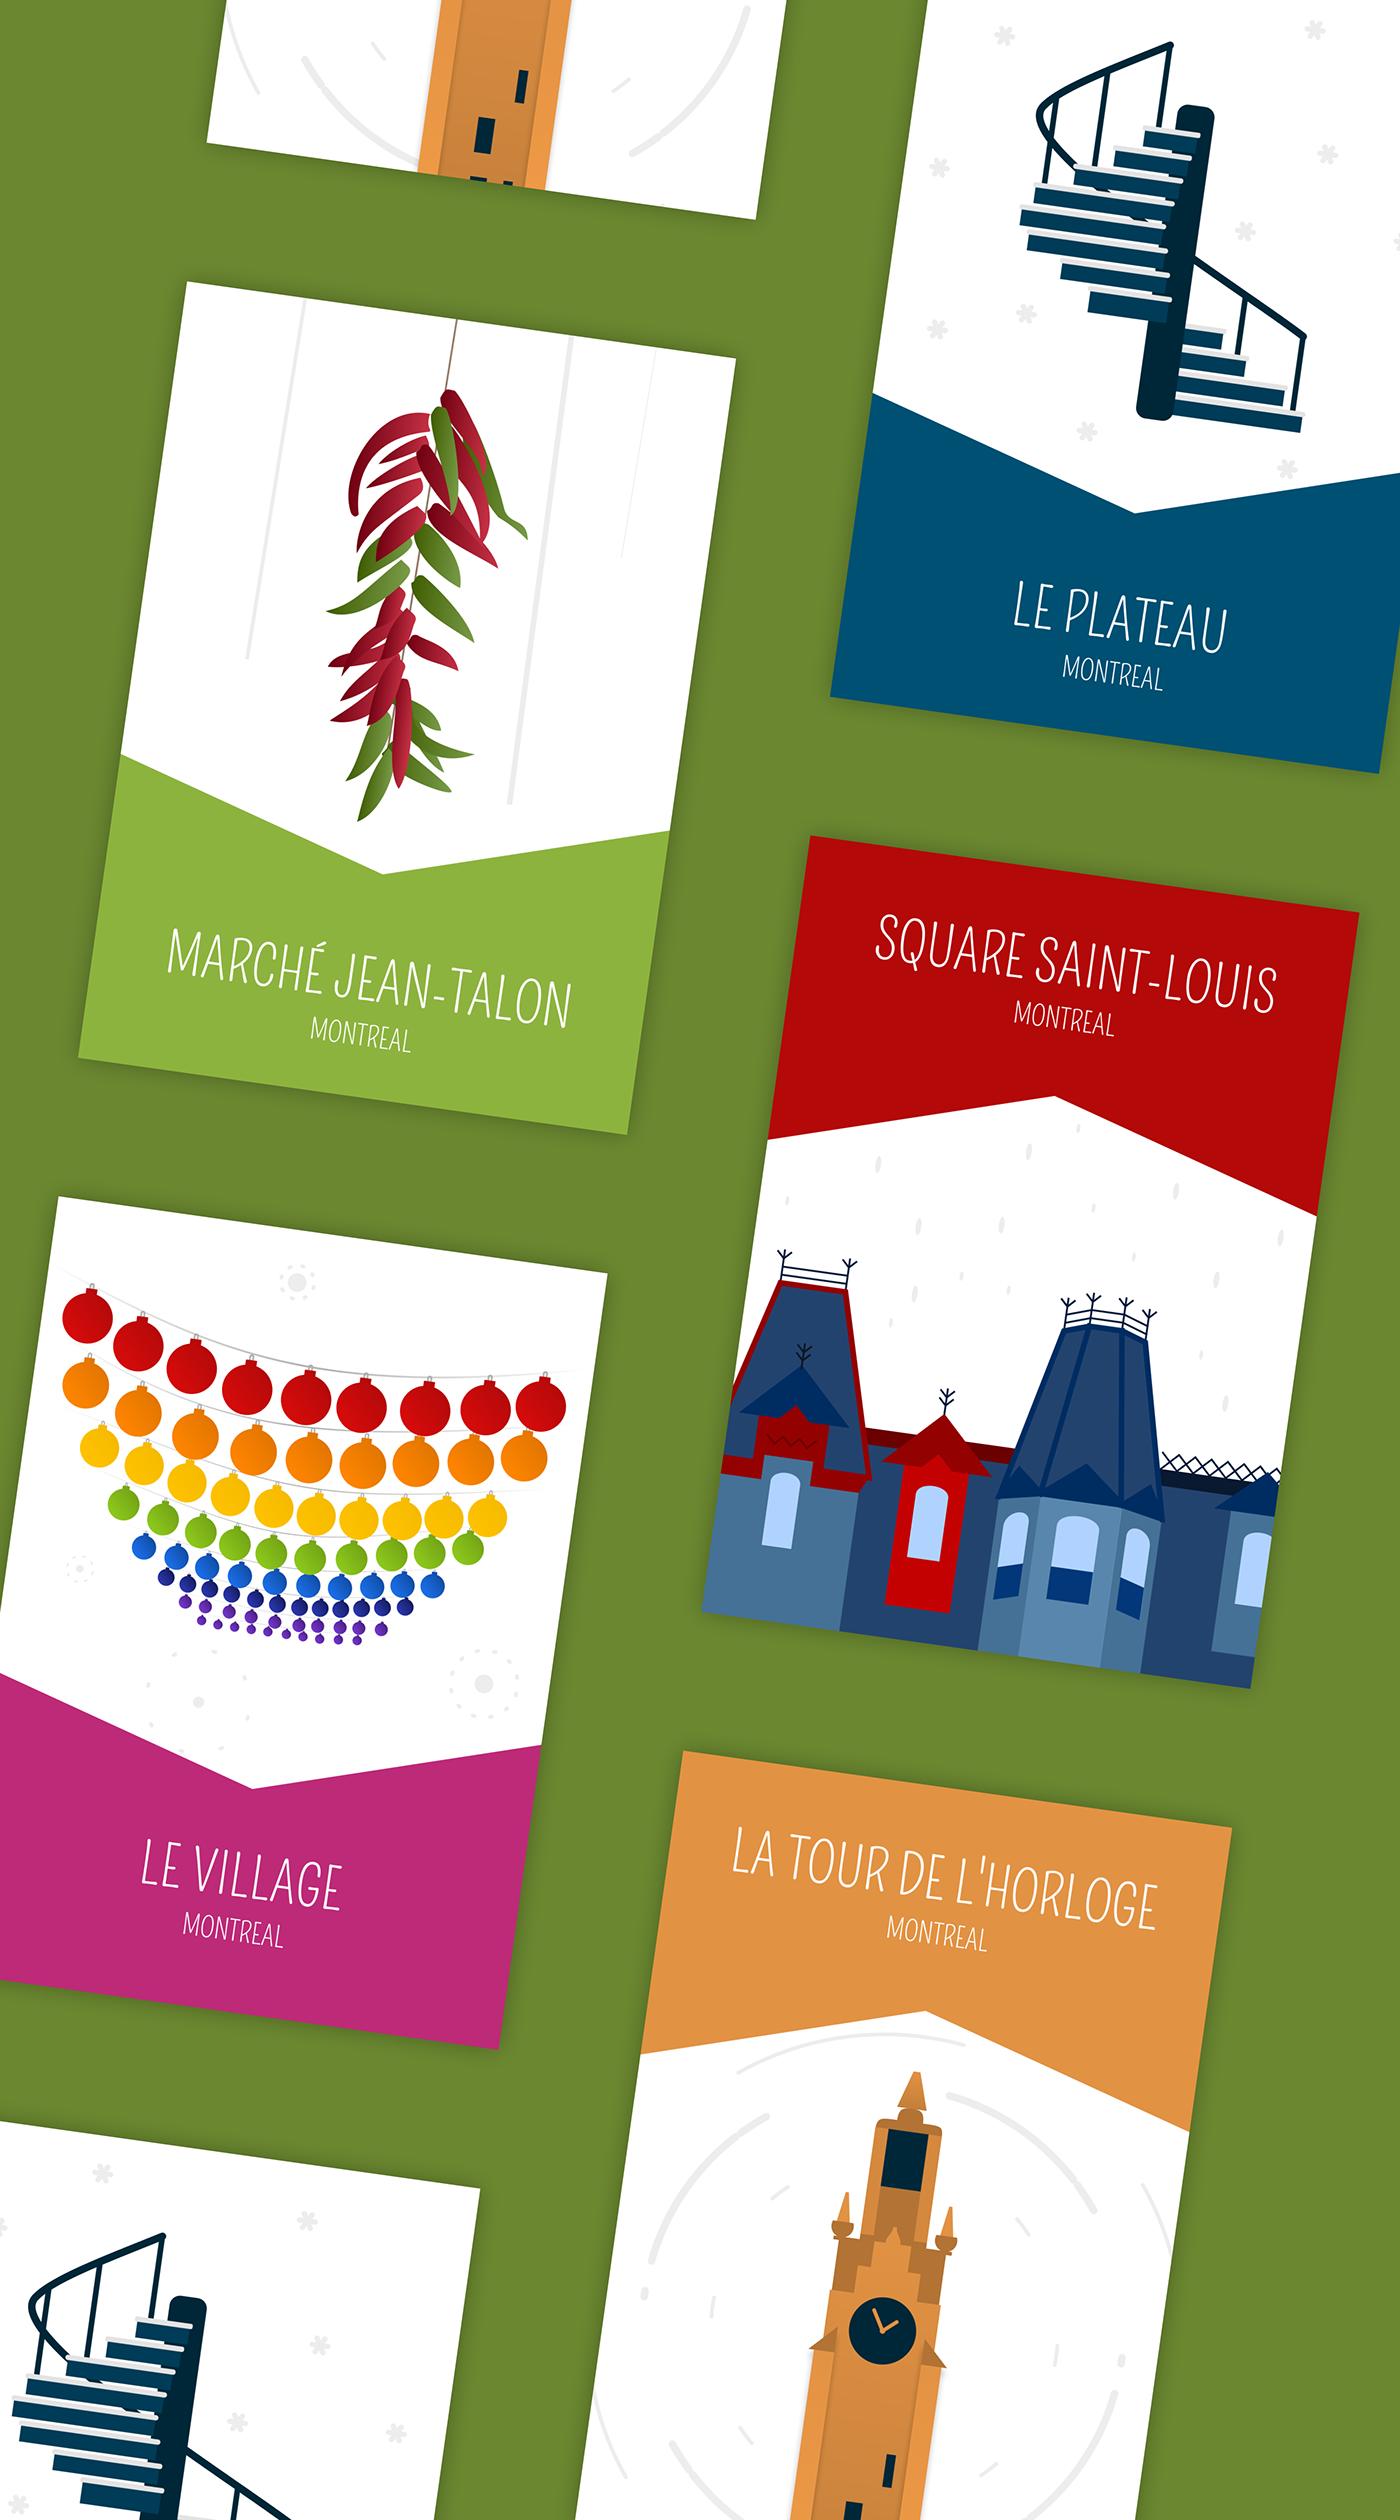 postcard postcards Montreal plateau